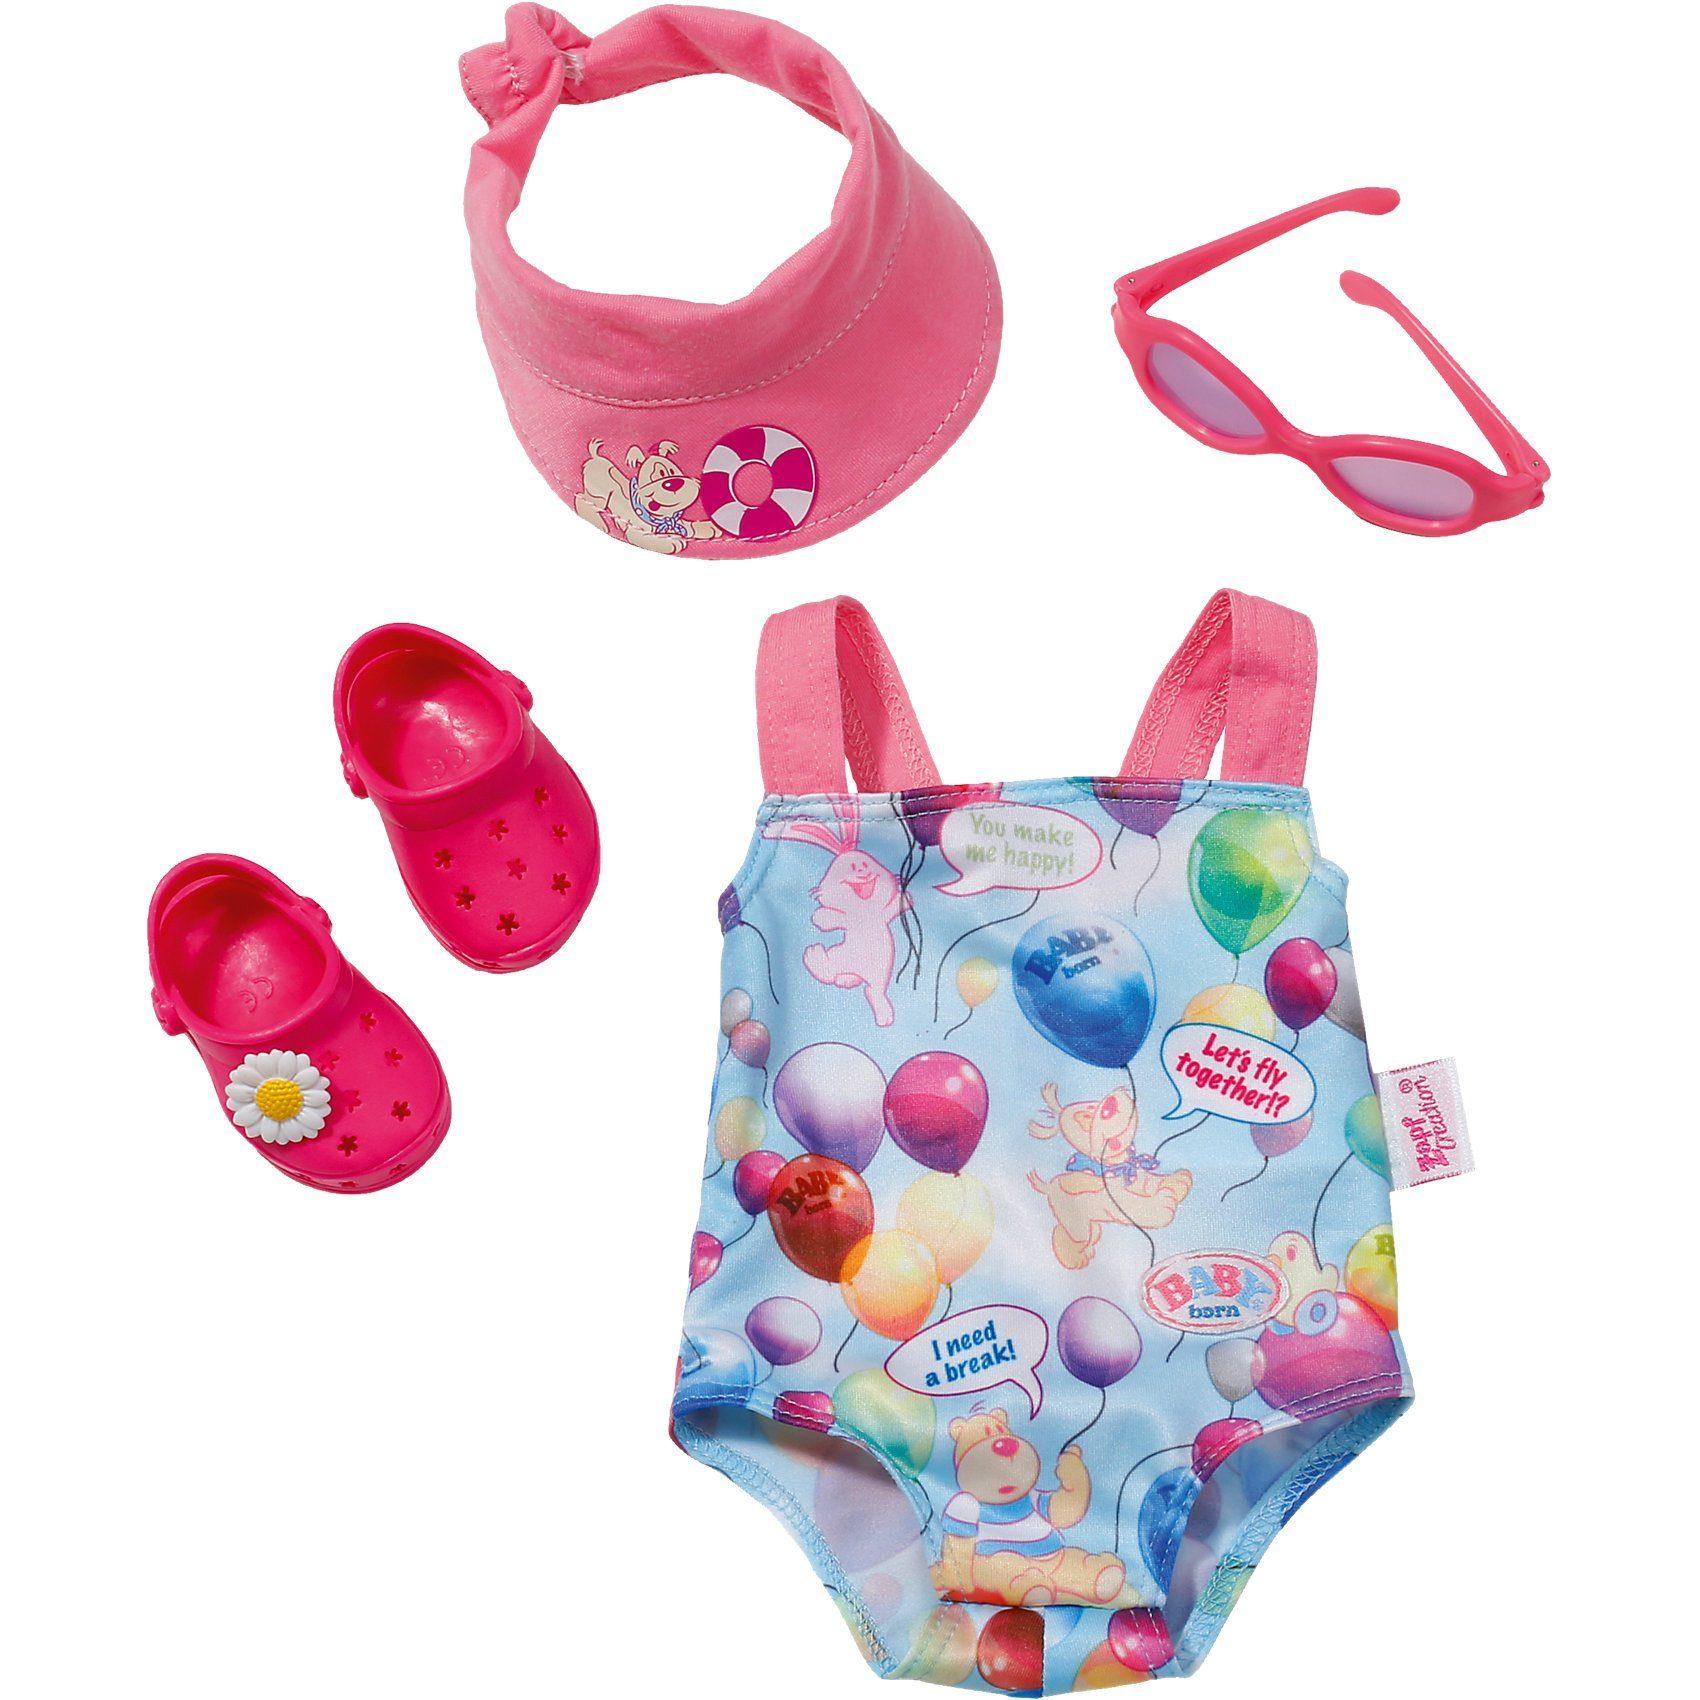 Zapf Creation BABY born® Puppenkleidung Badeanzug-Set